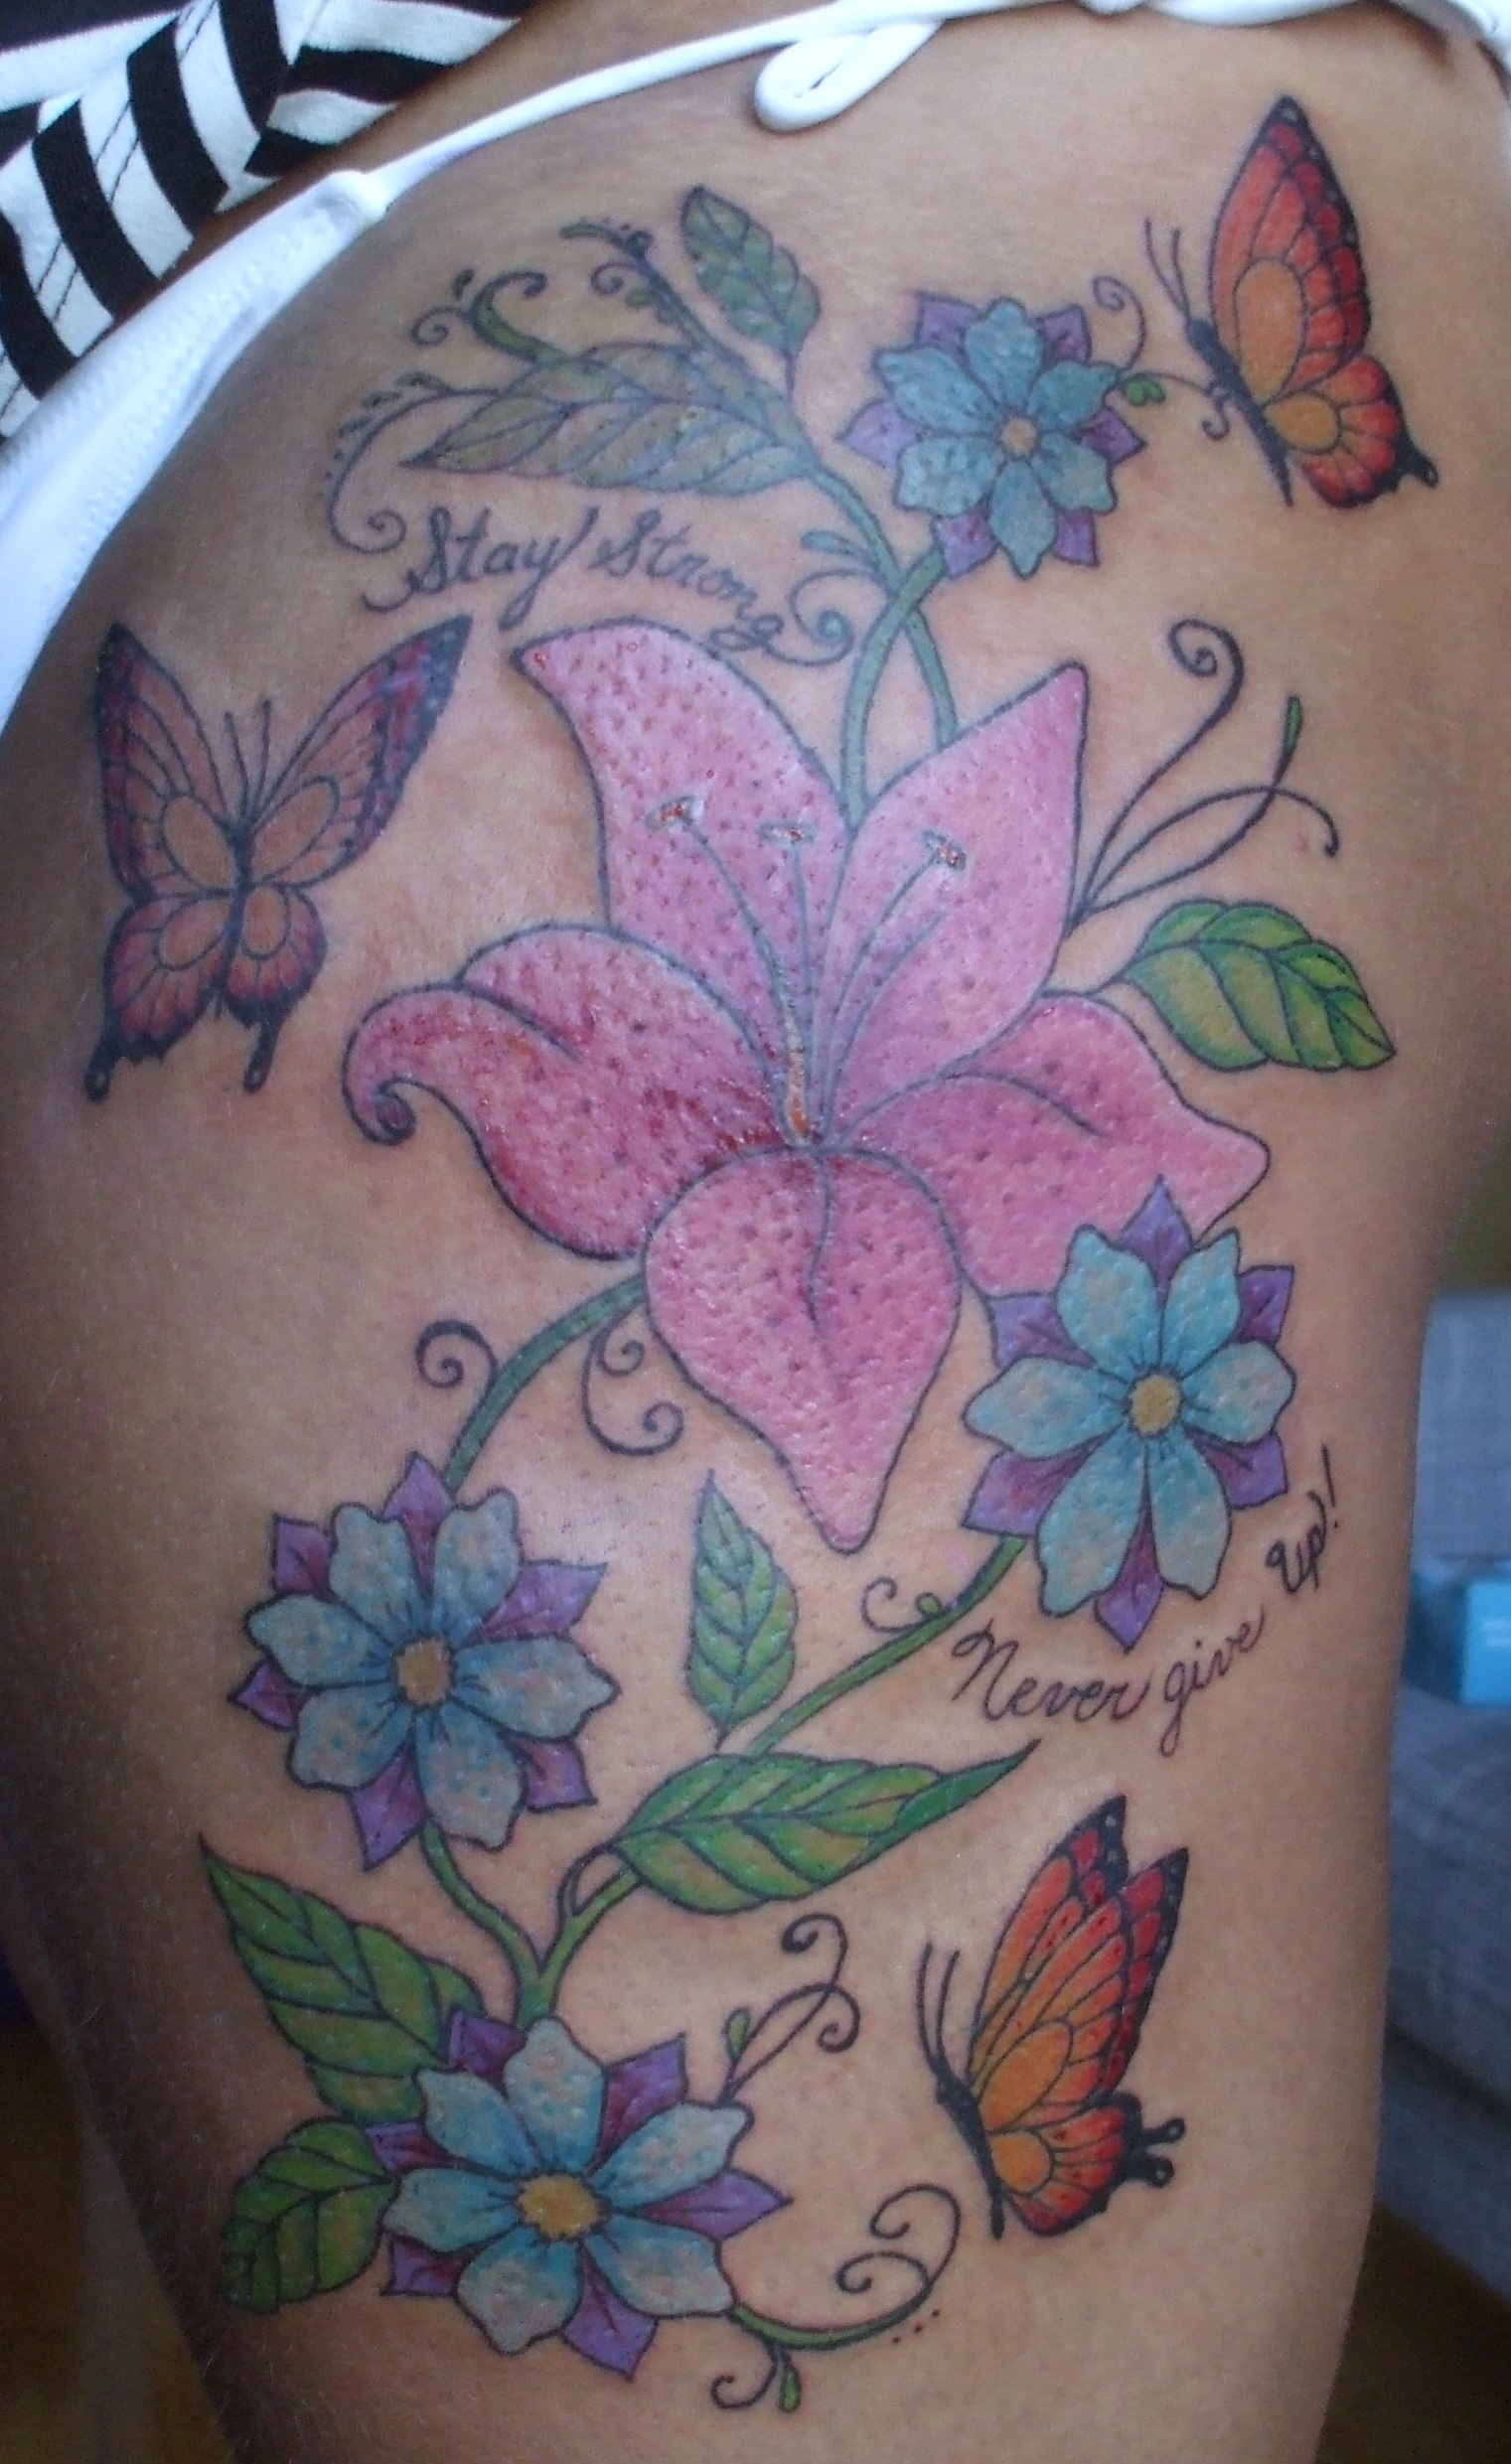 Pz c tatouage fleur - Tatouage fleur dos ...